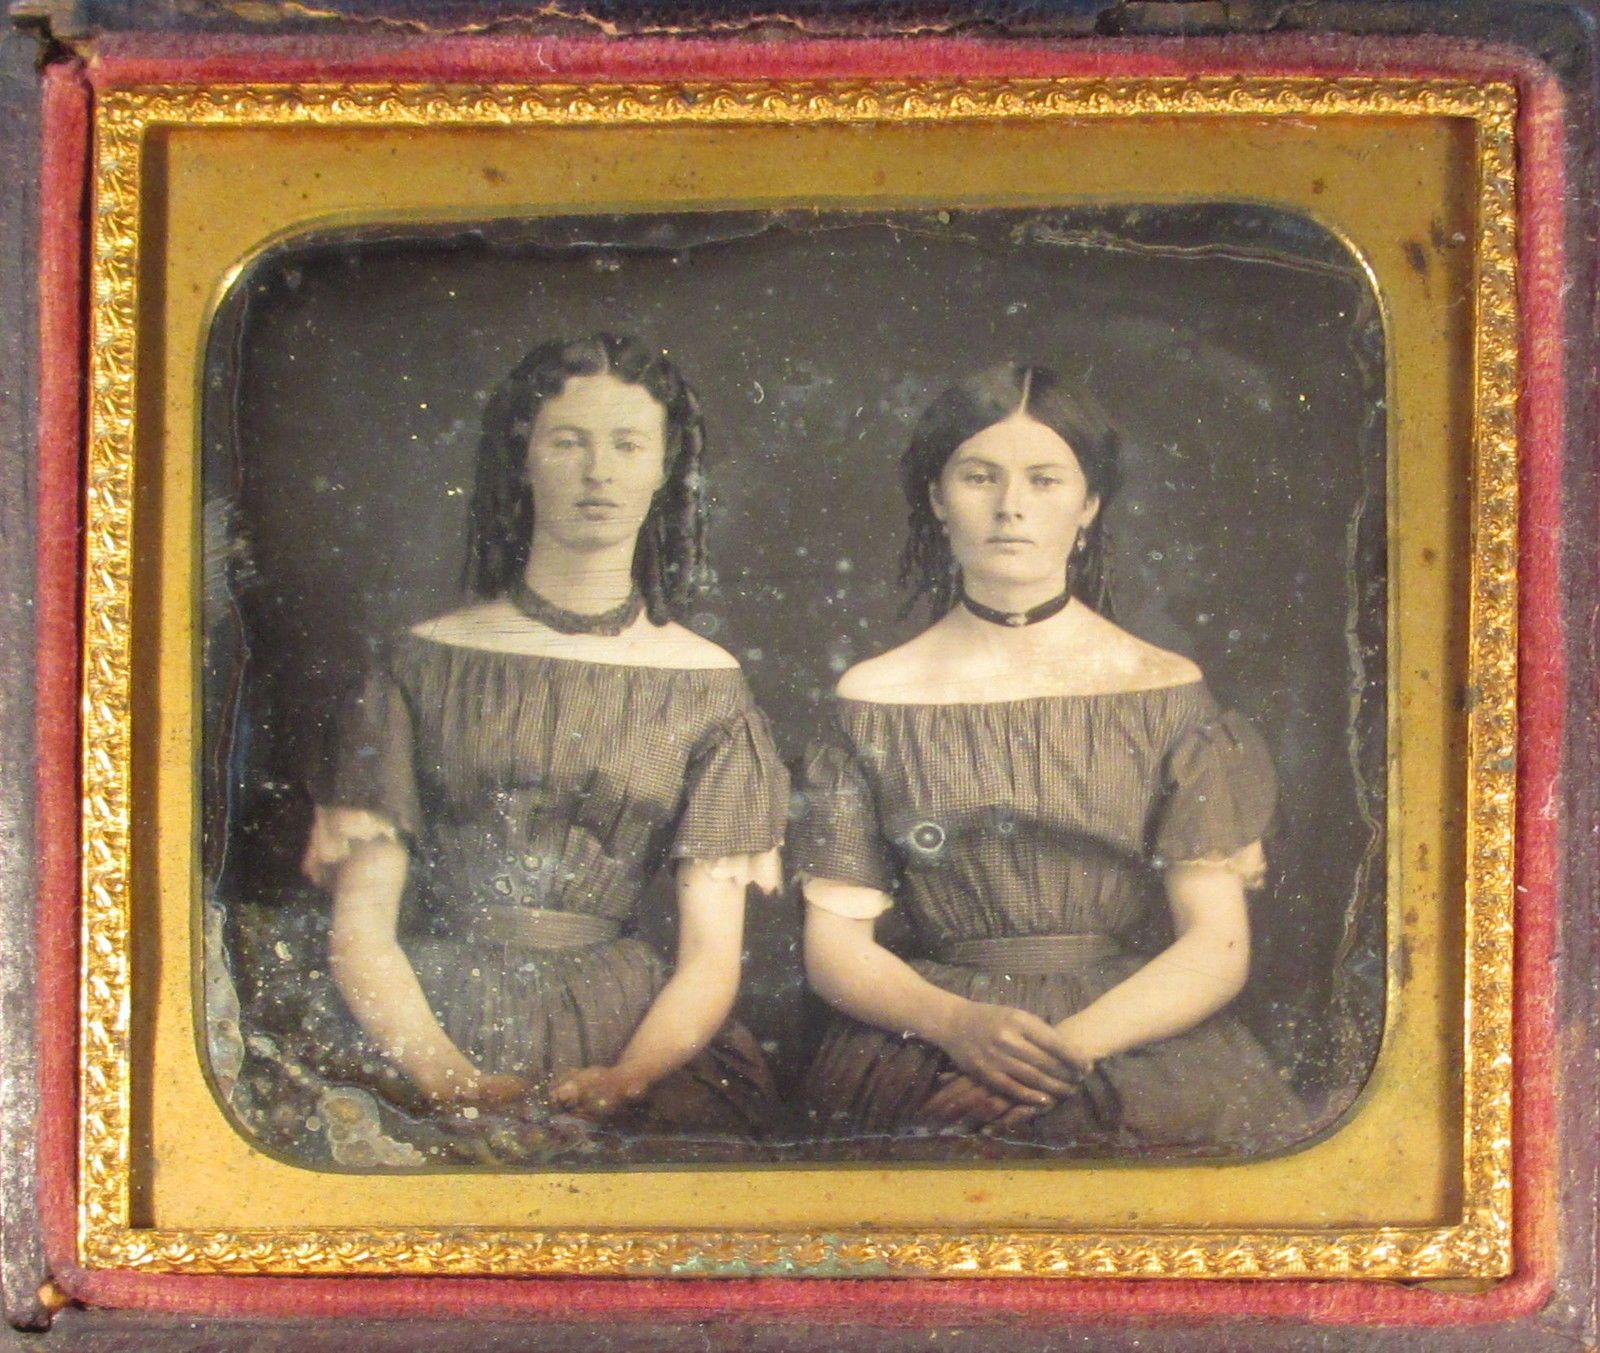 Sultry Sisters Daguerreotype | eBay